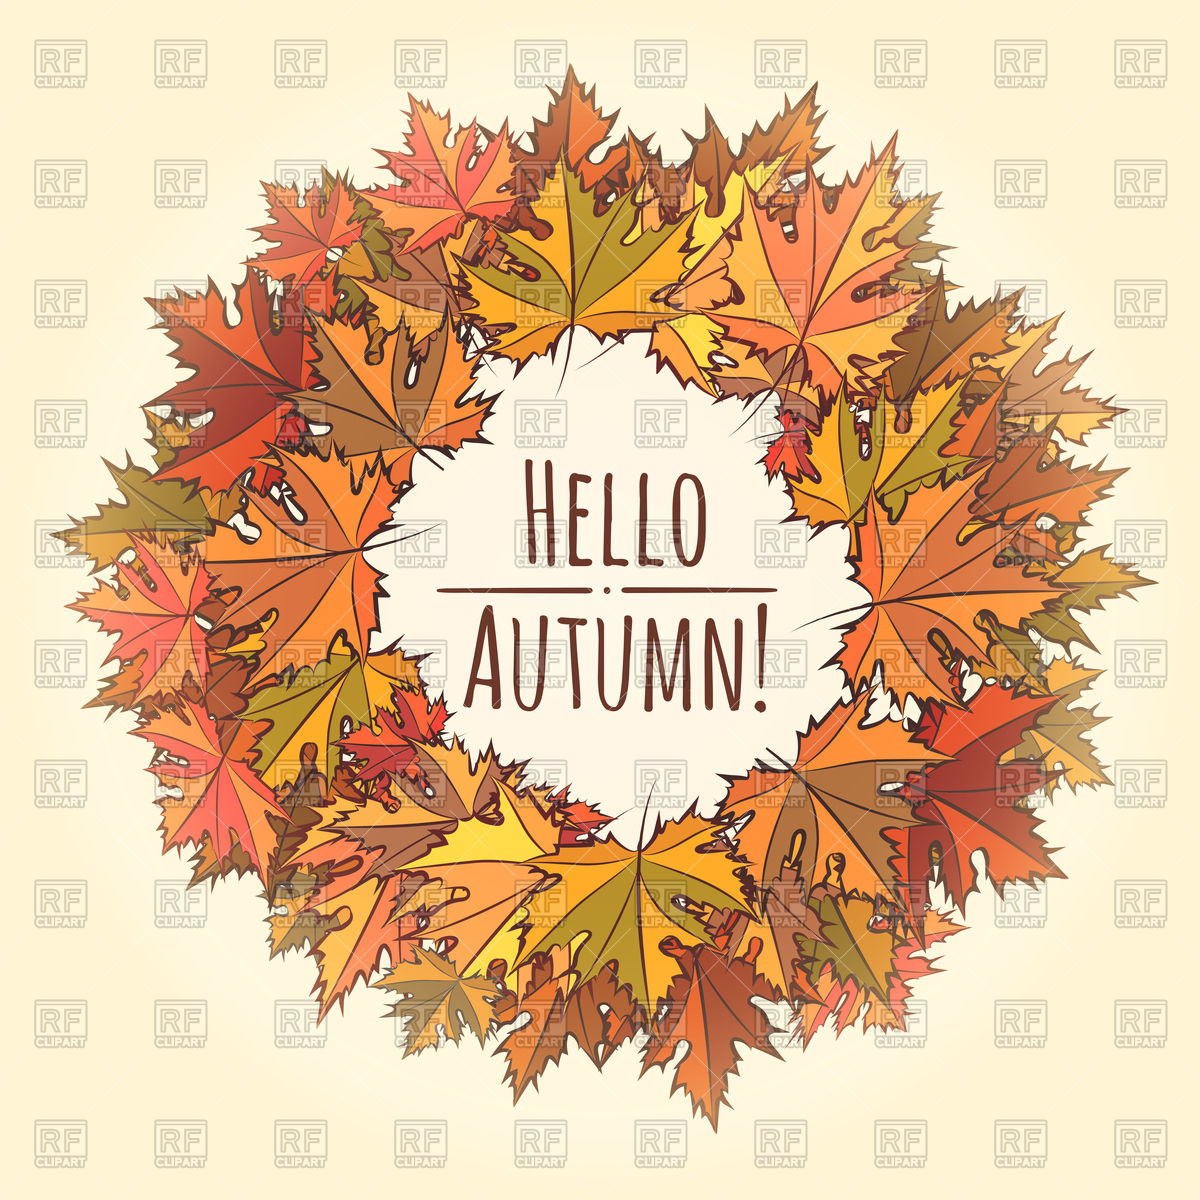 1200x1200 Autumn Round Frame With Wording Hello Autumn Vector Image Vector